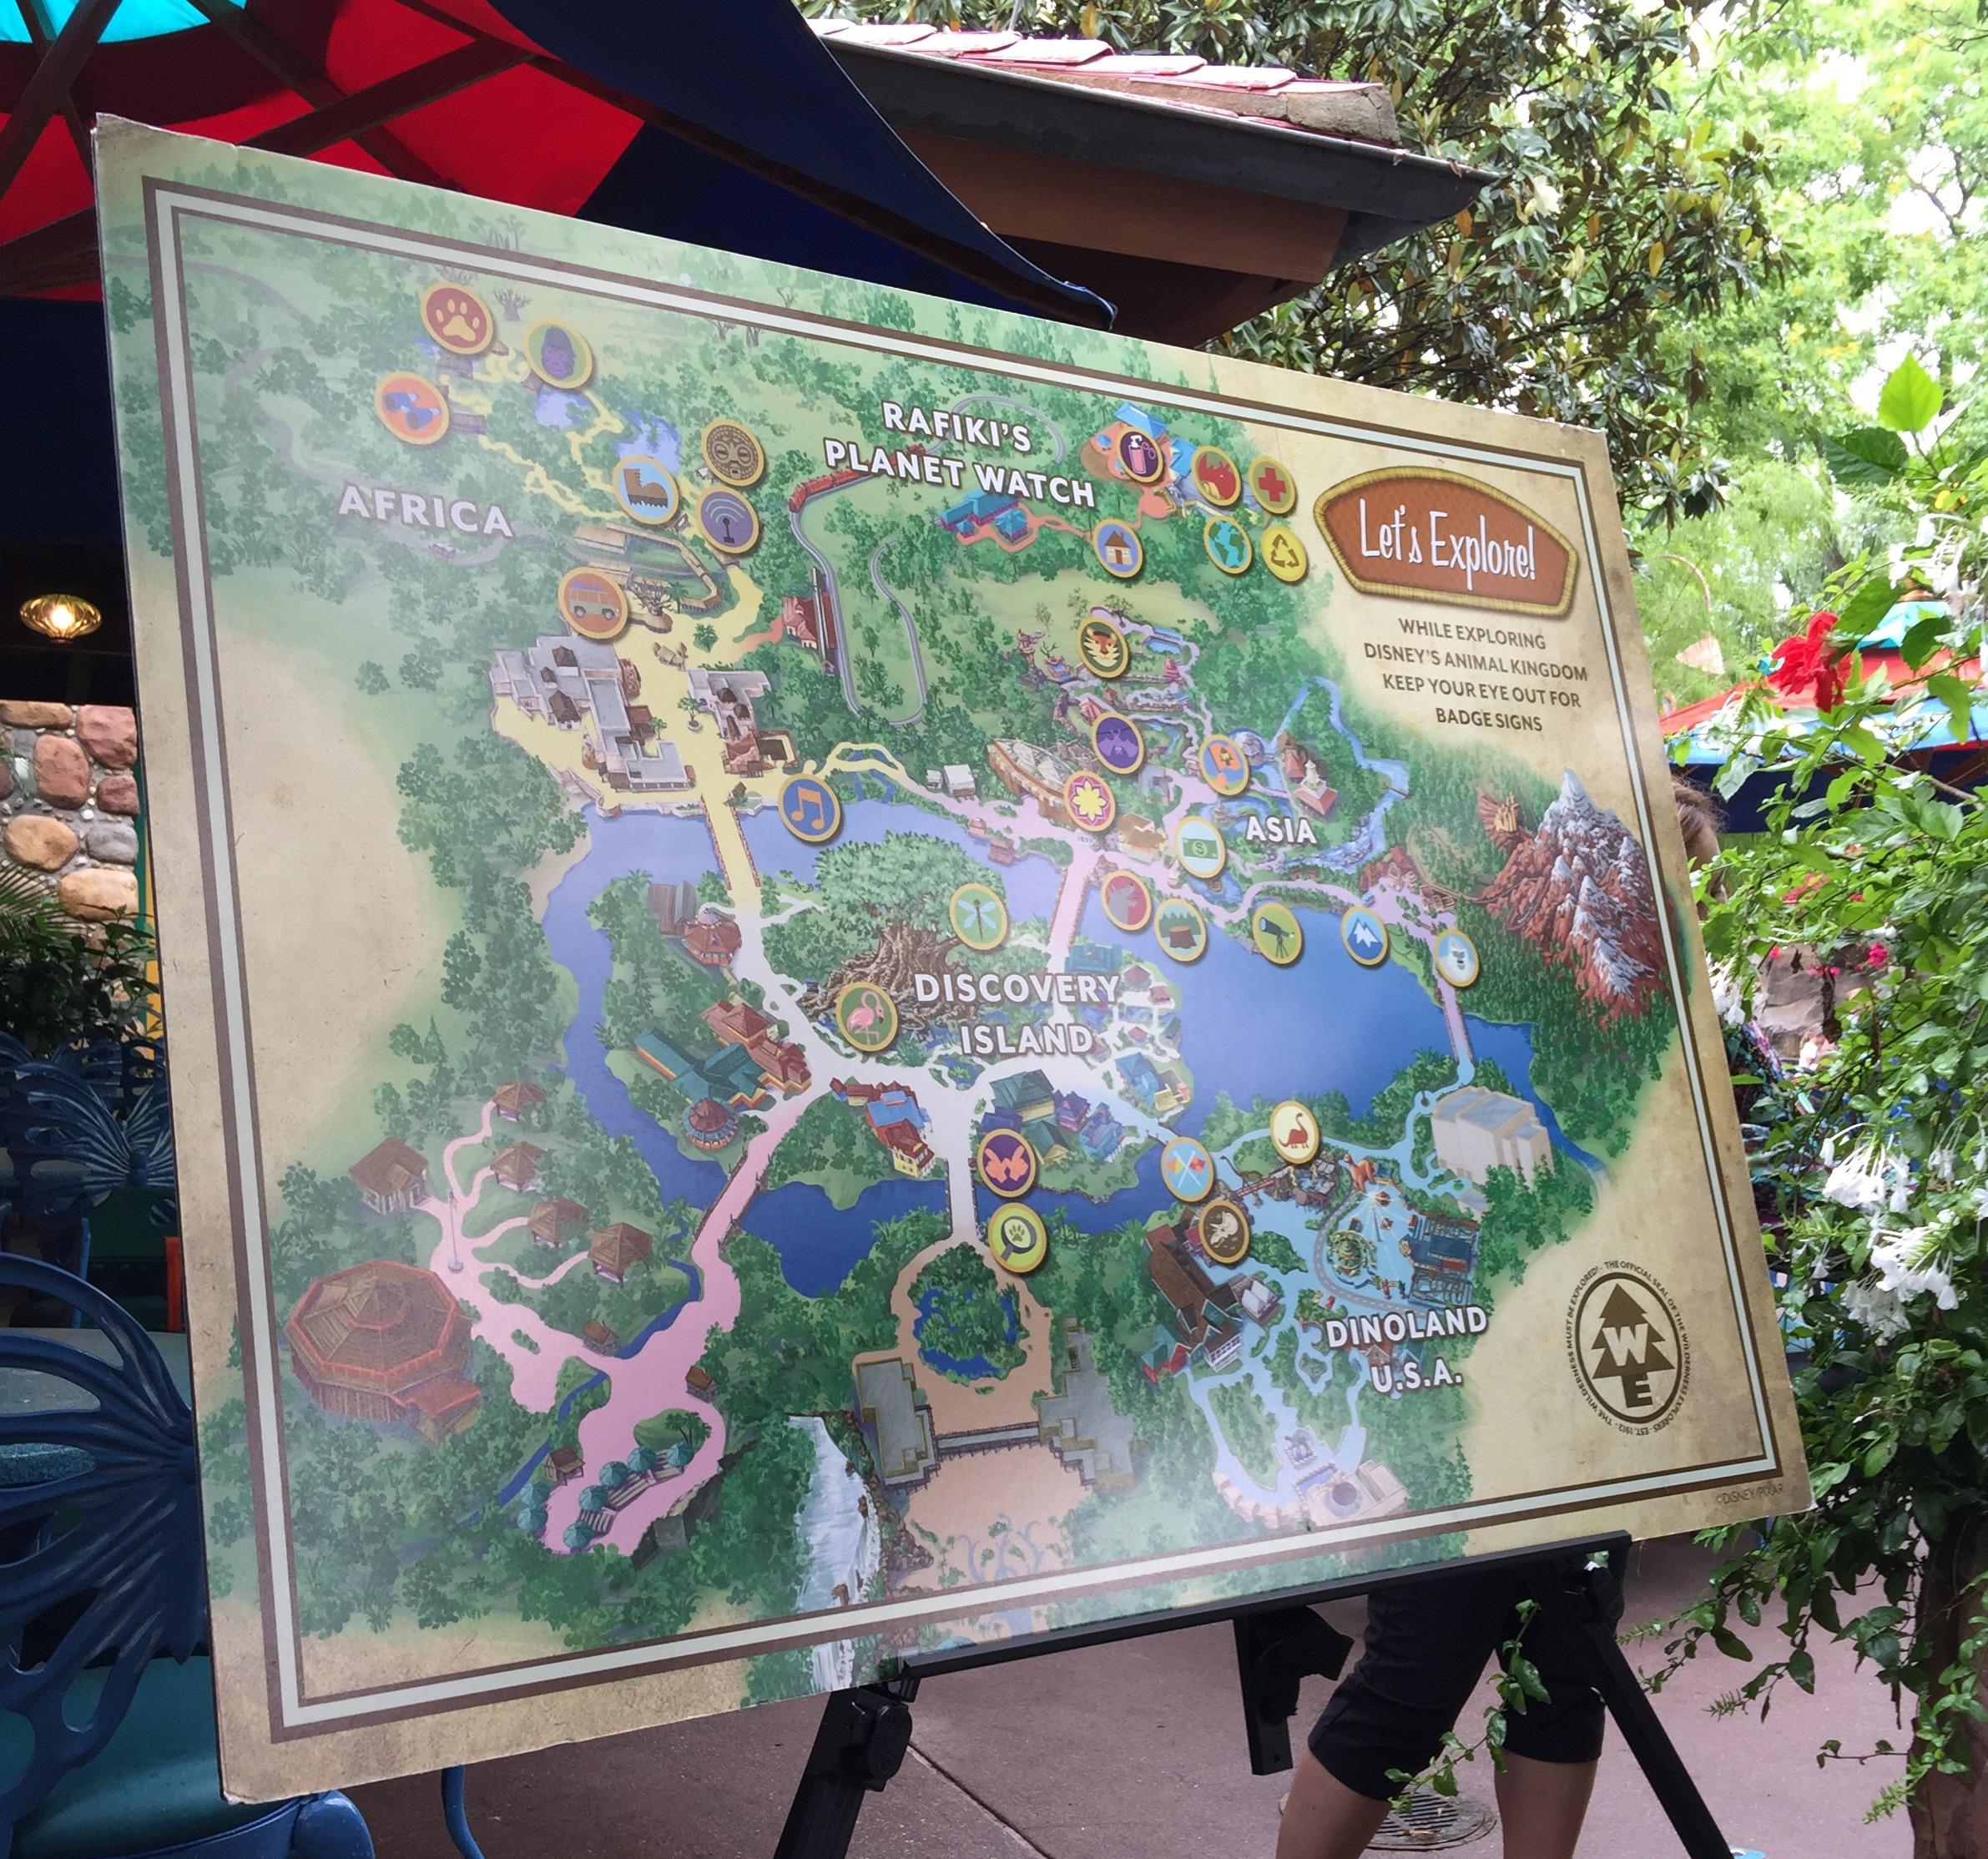 Disney's Animal Kingdom's Wilderness Explorers Program #MonkeyKingdomEvent